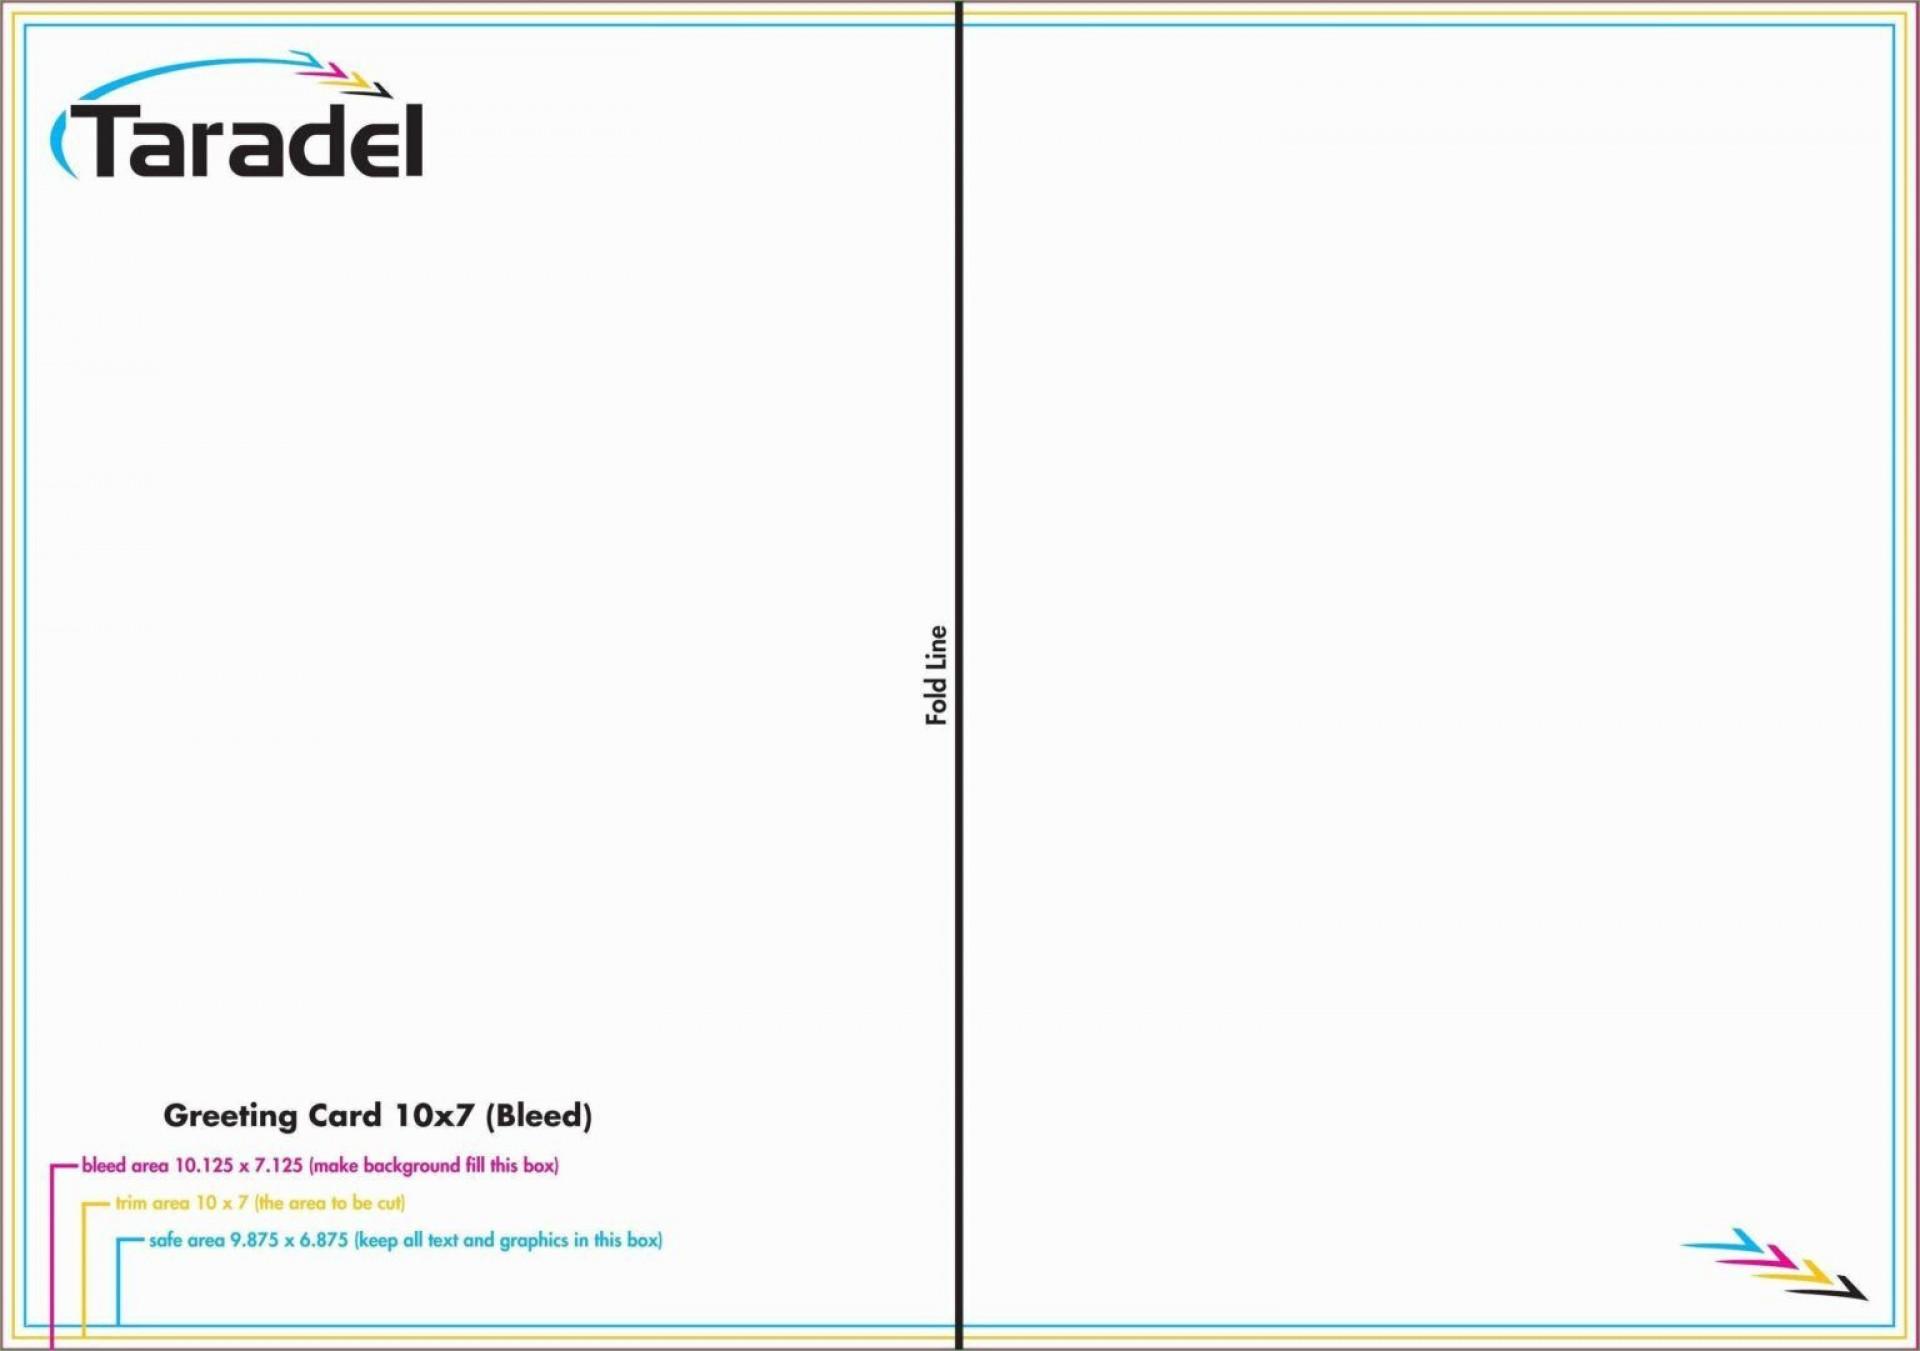 002 Stupendou Quarter Fold Greeting Card Template Free Inspiration 1920